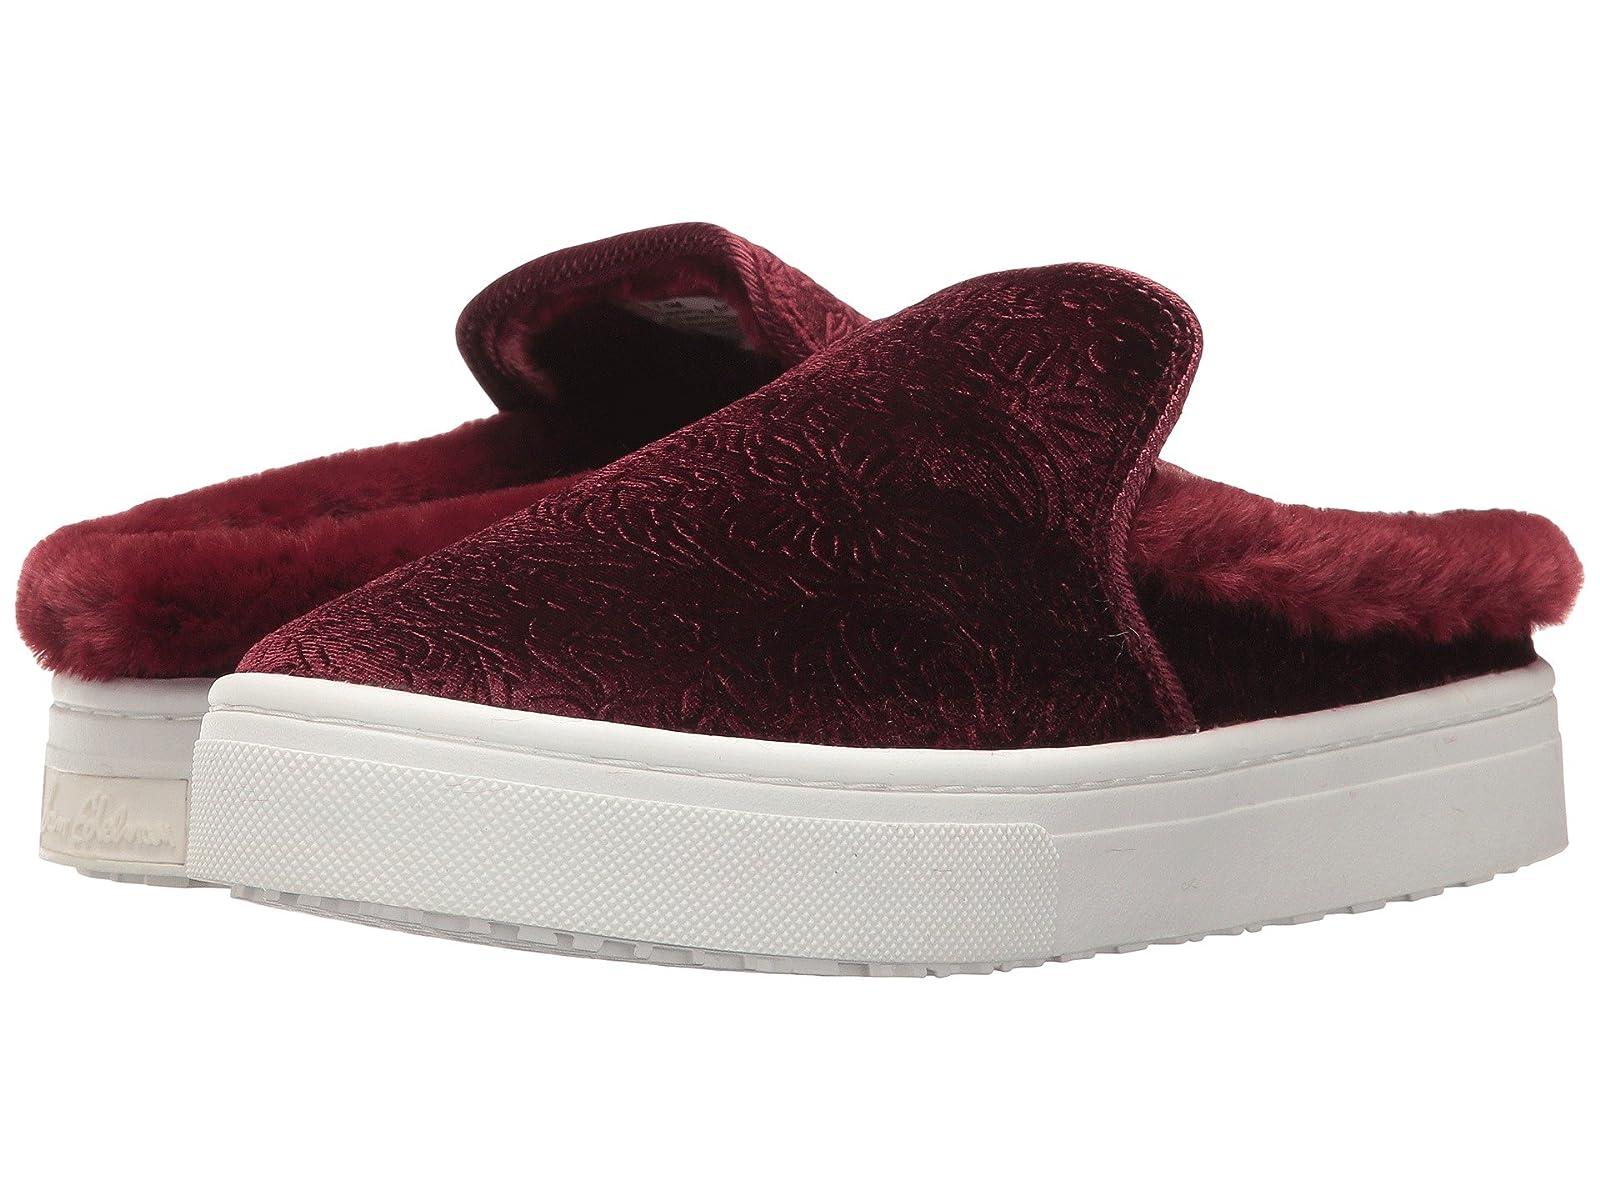 Sam Edelman LevonneCheap and distinctive eye-catching shoes